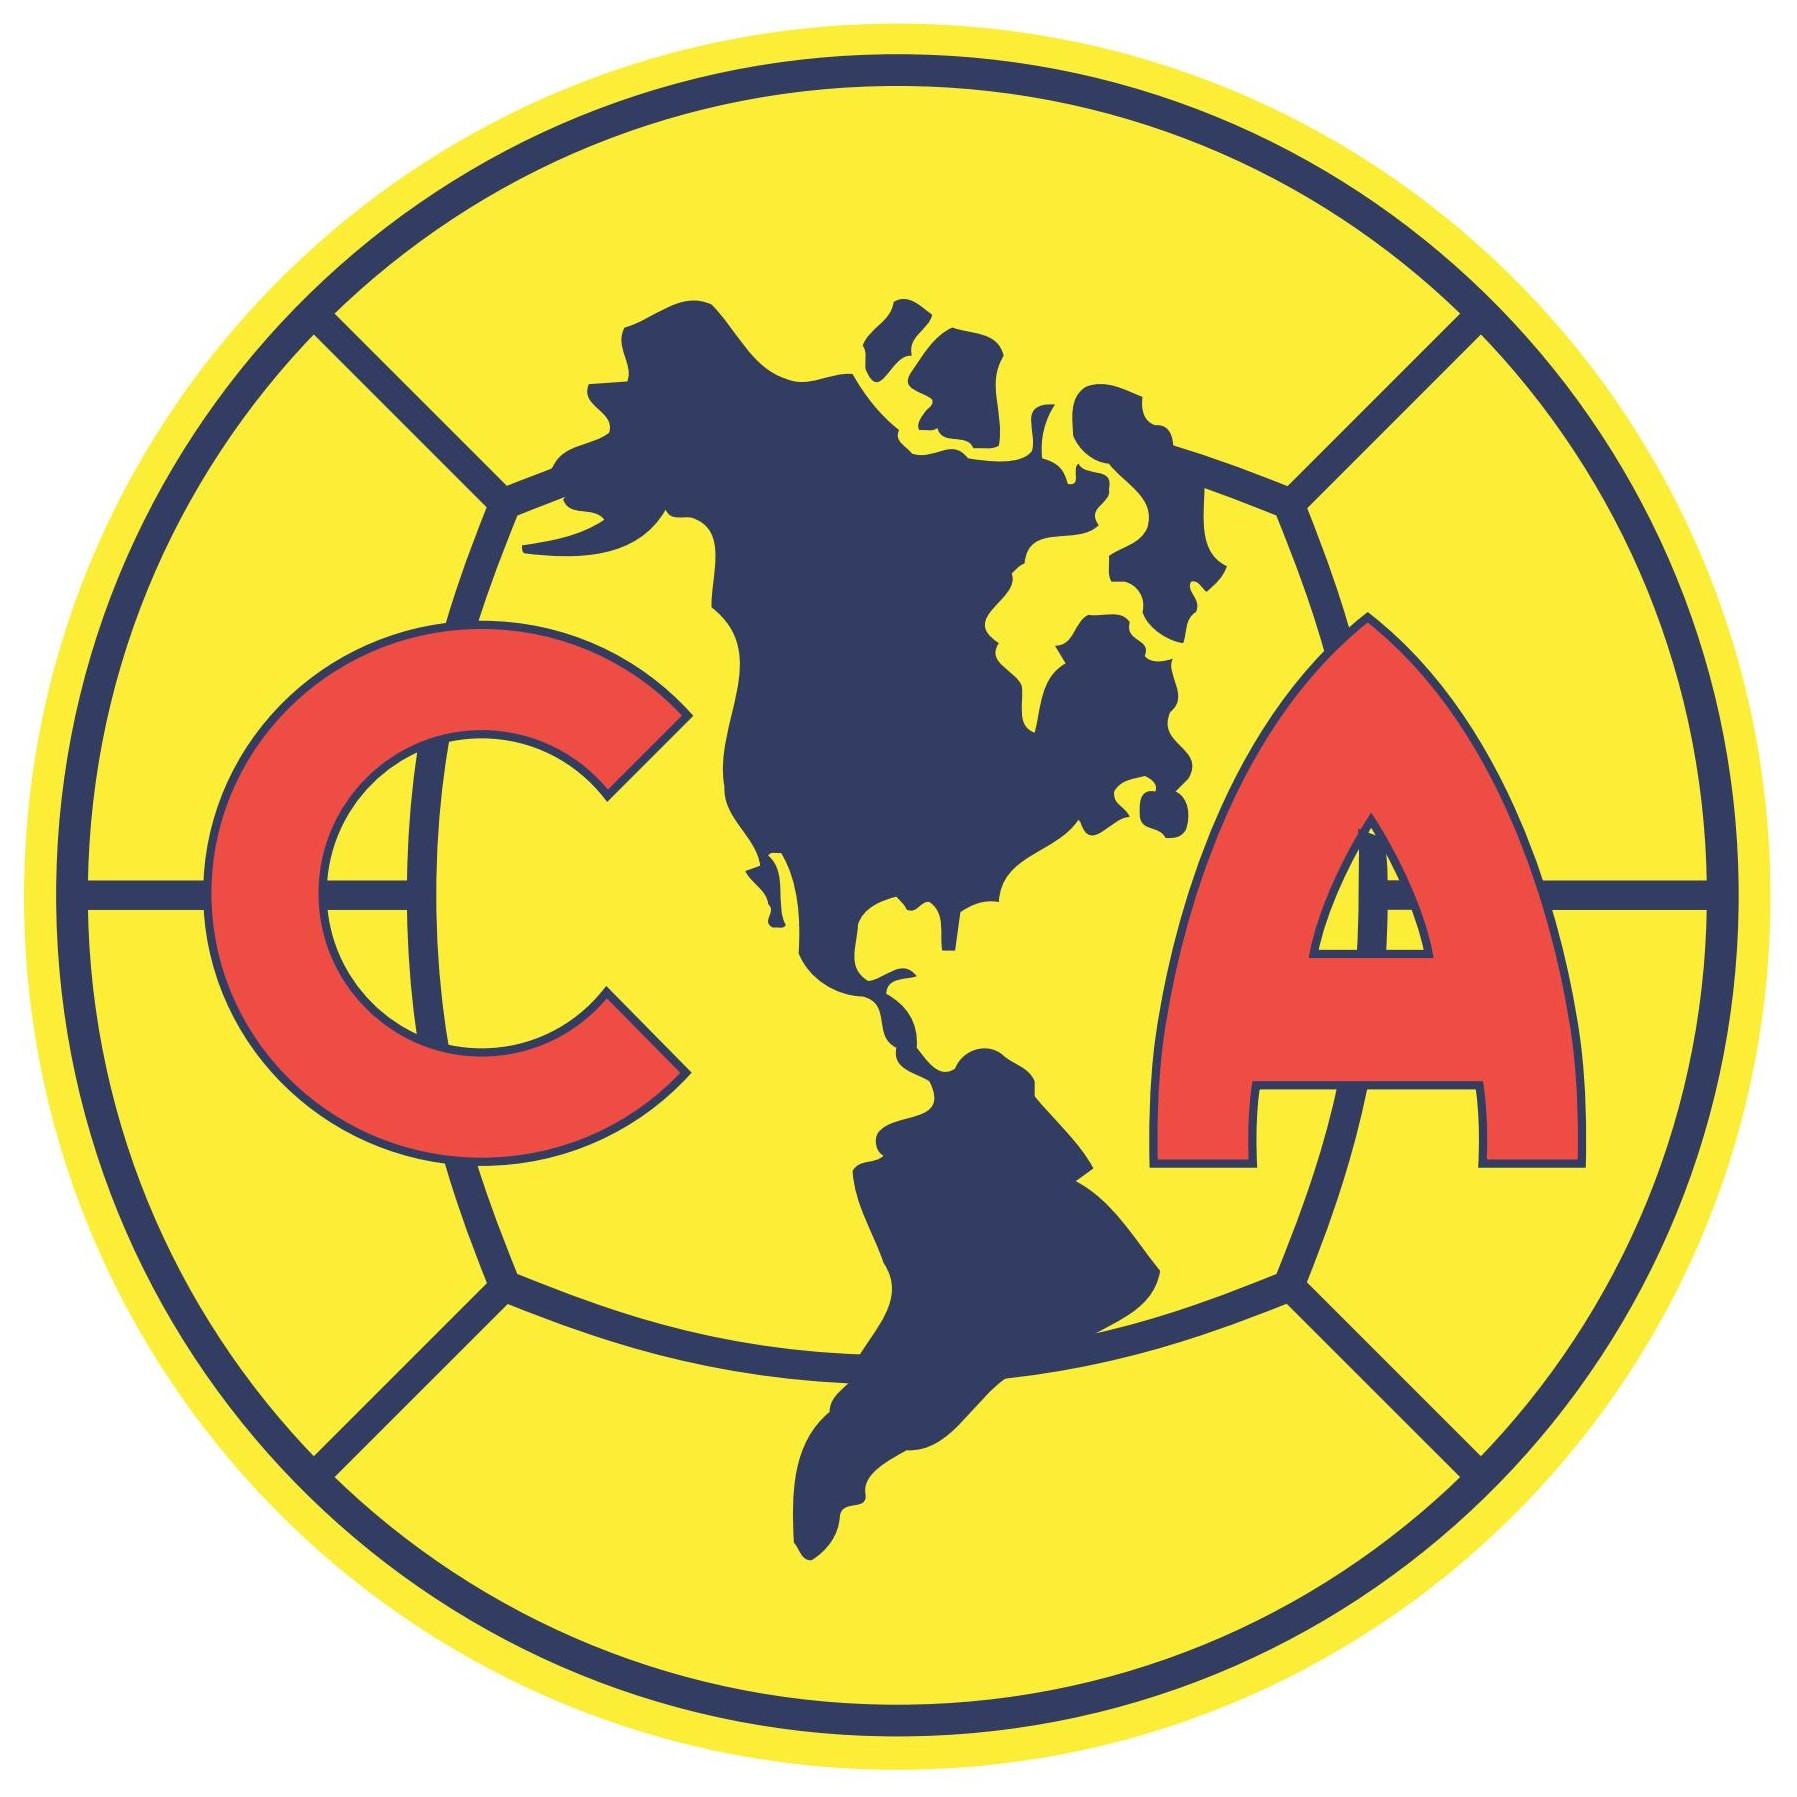 America Soccer Team Logos